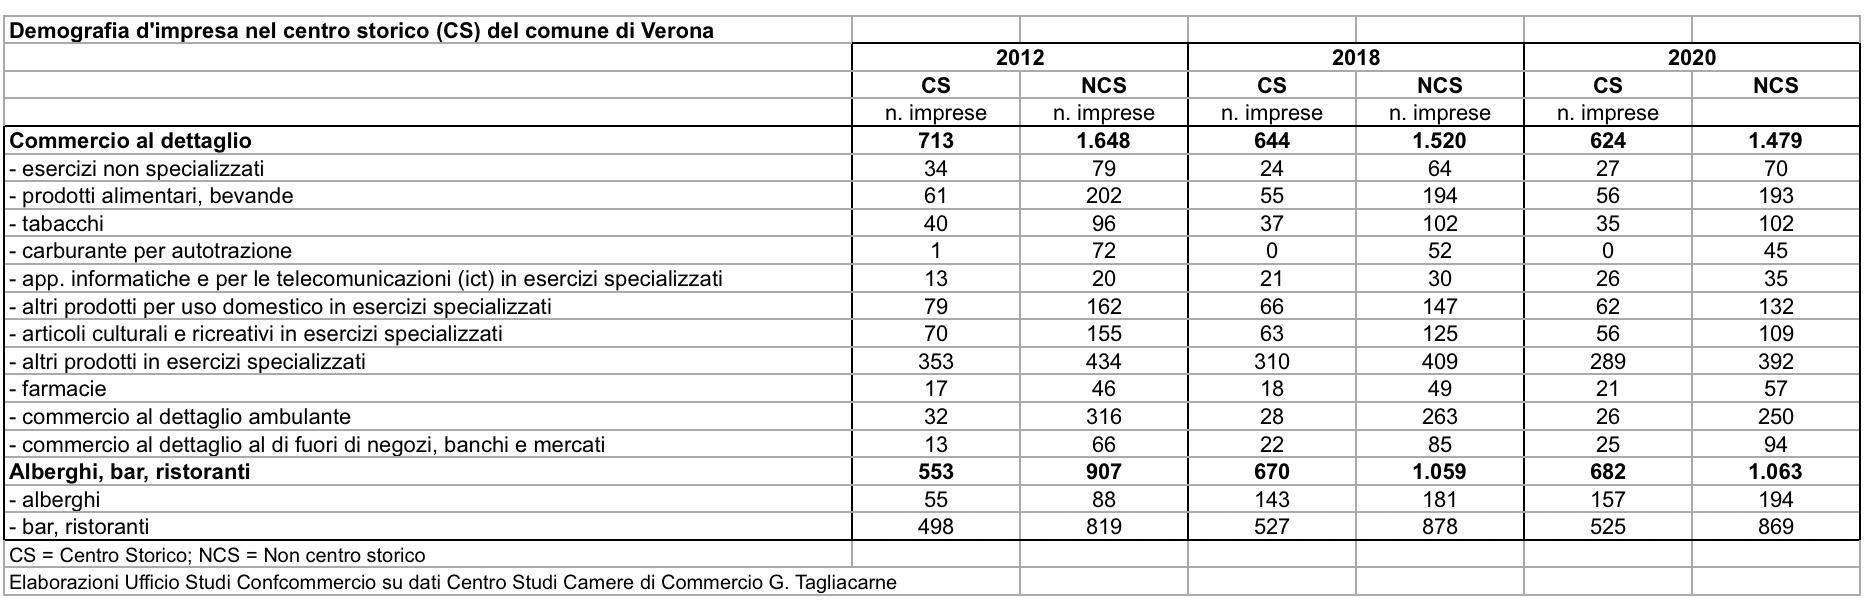 Demografia d'impresa del Centro Storico di Verona.